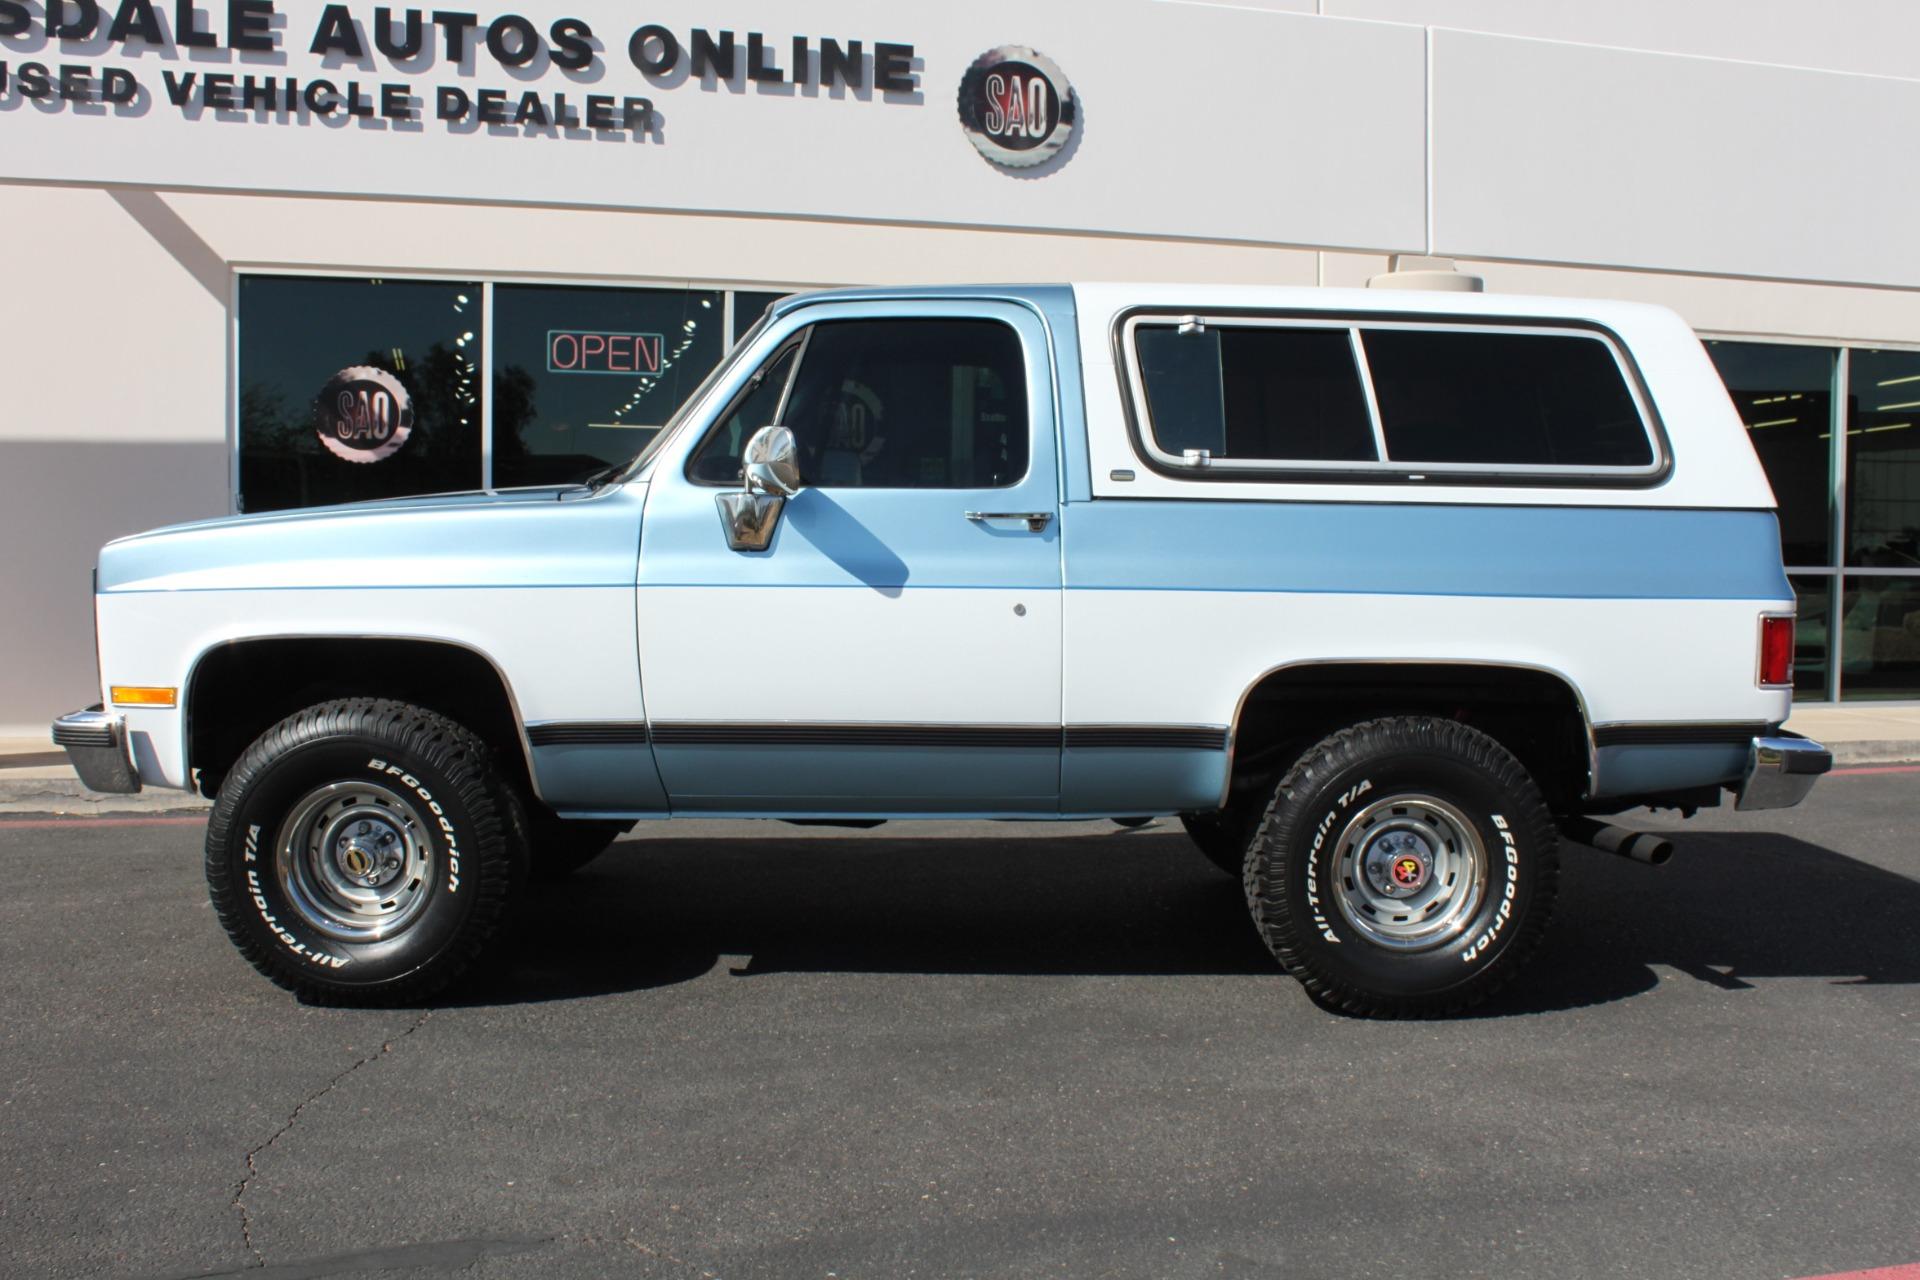 Used-1989-Chevrolet-K5-Blazer-4X4-Wagoneer